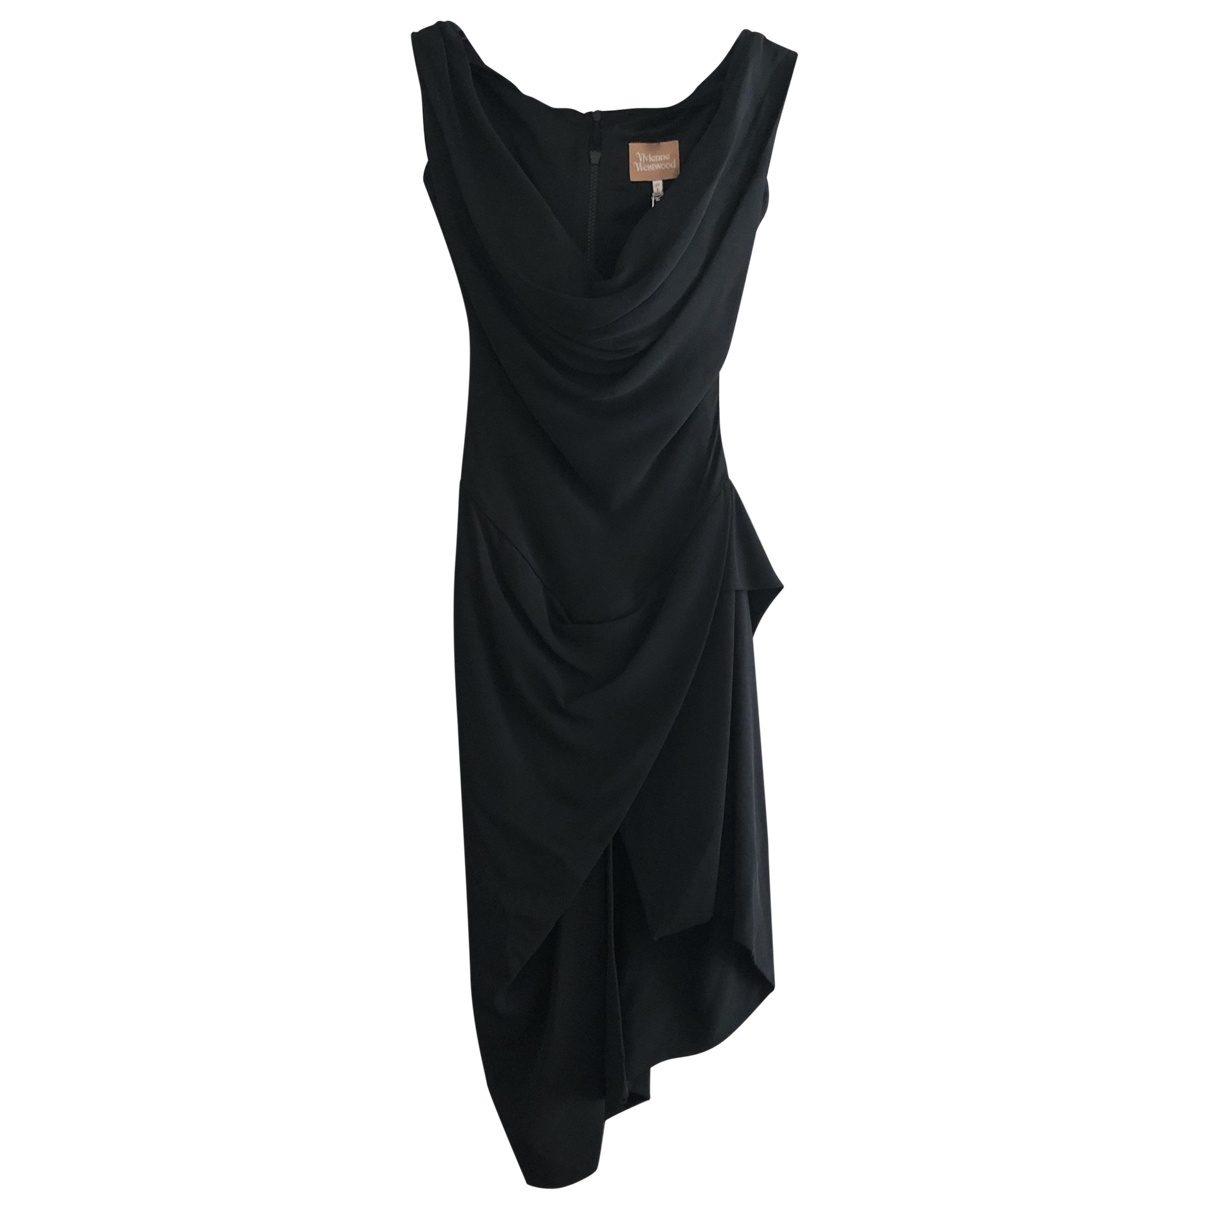 Vivienne Westwood \N Black dress for Women 6 UK